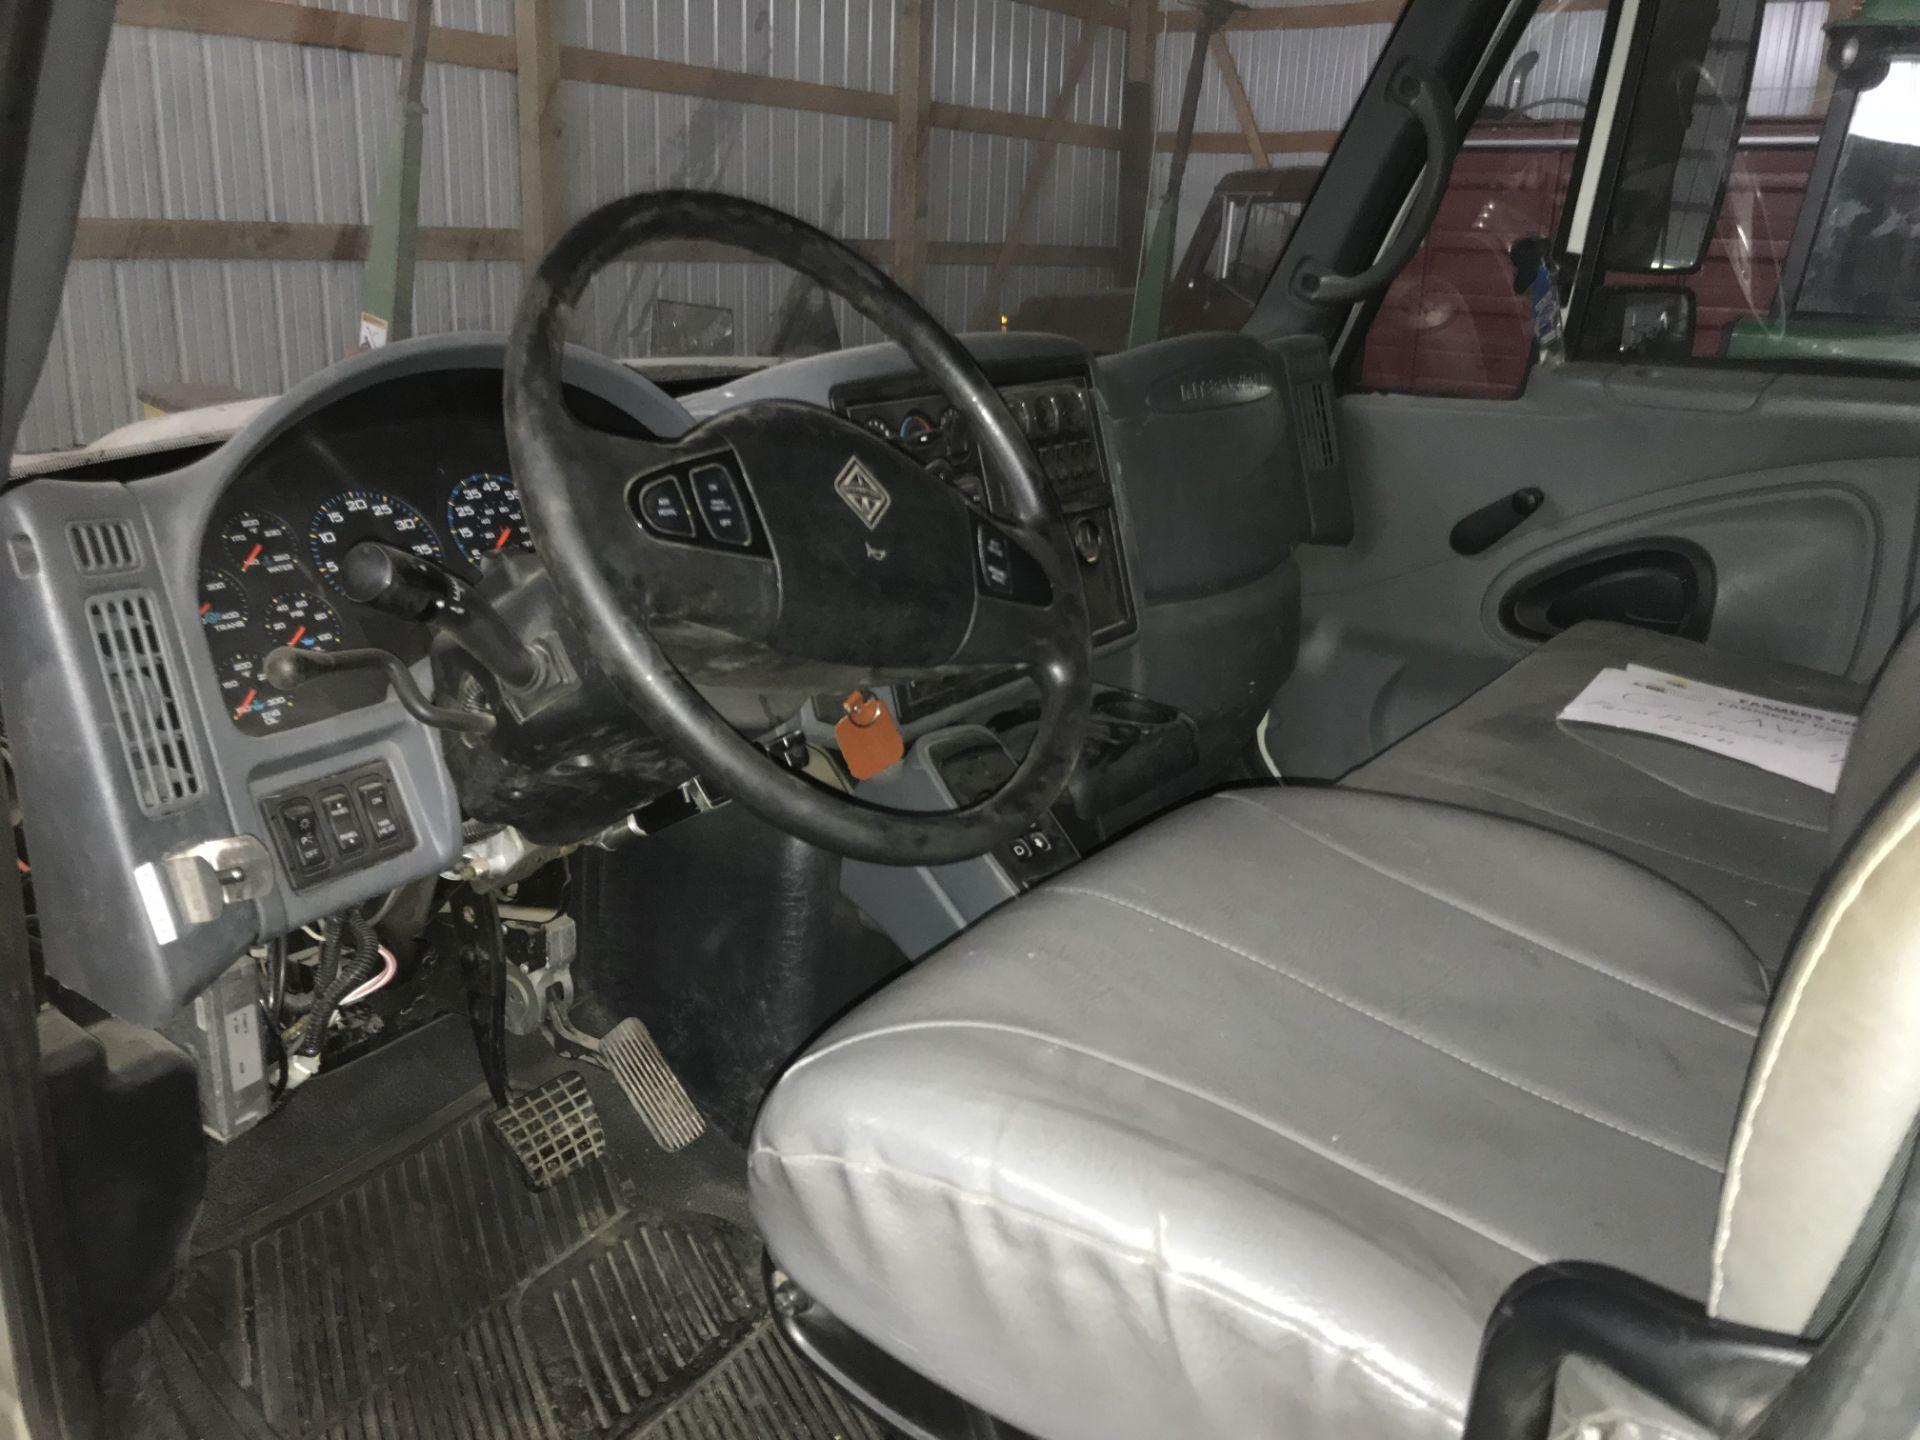 Lot 7 - 2003 International 7400 DT-530, 8.7lt Diesel, 6spd Auto, AC, Cruise, Tilt, Air Seat, Scotts 20'